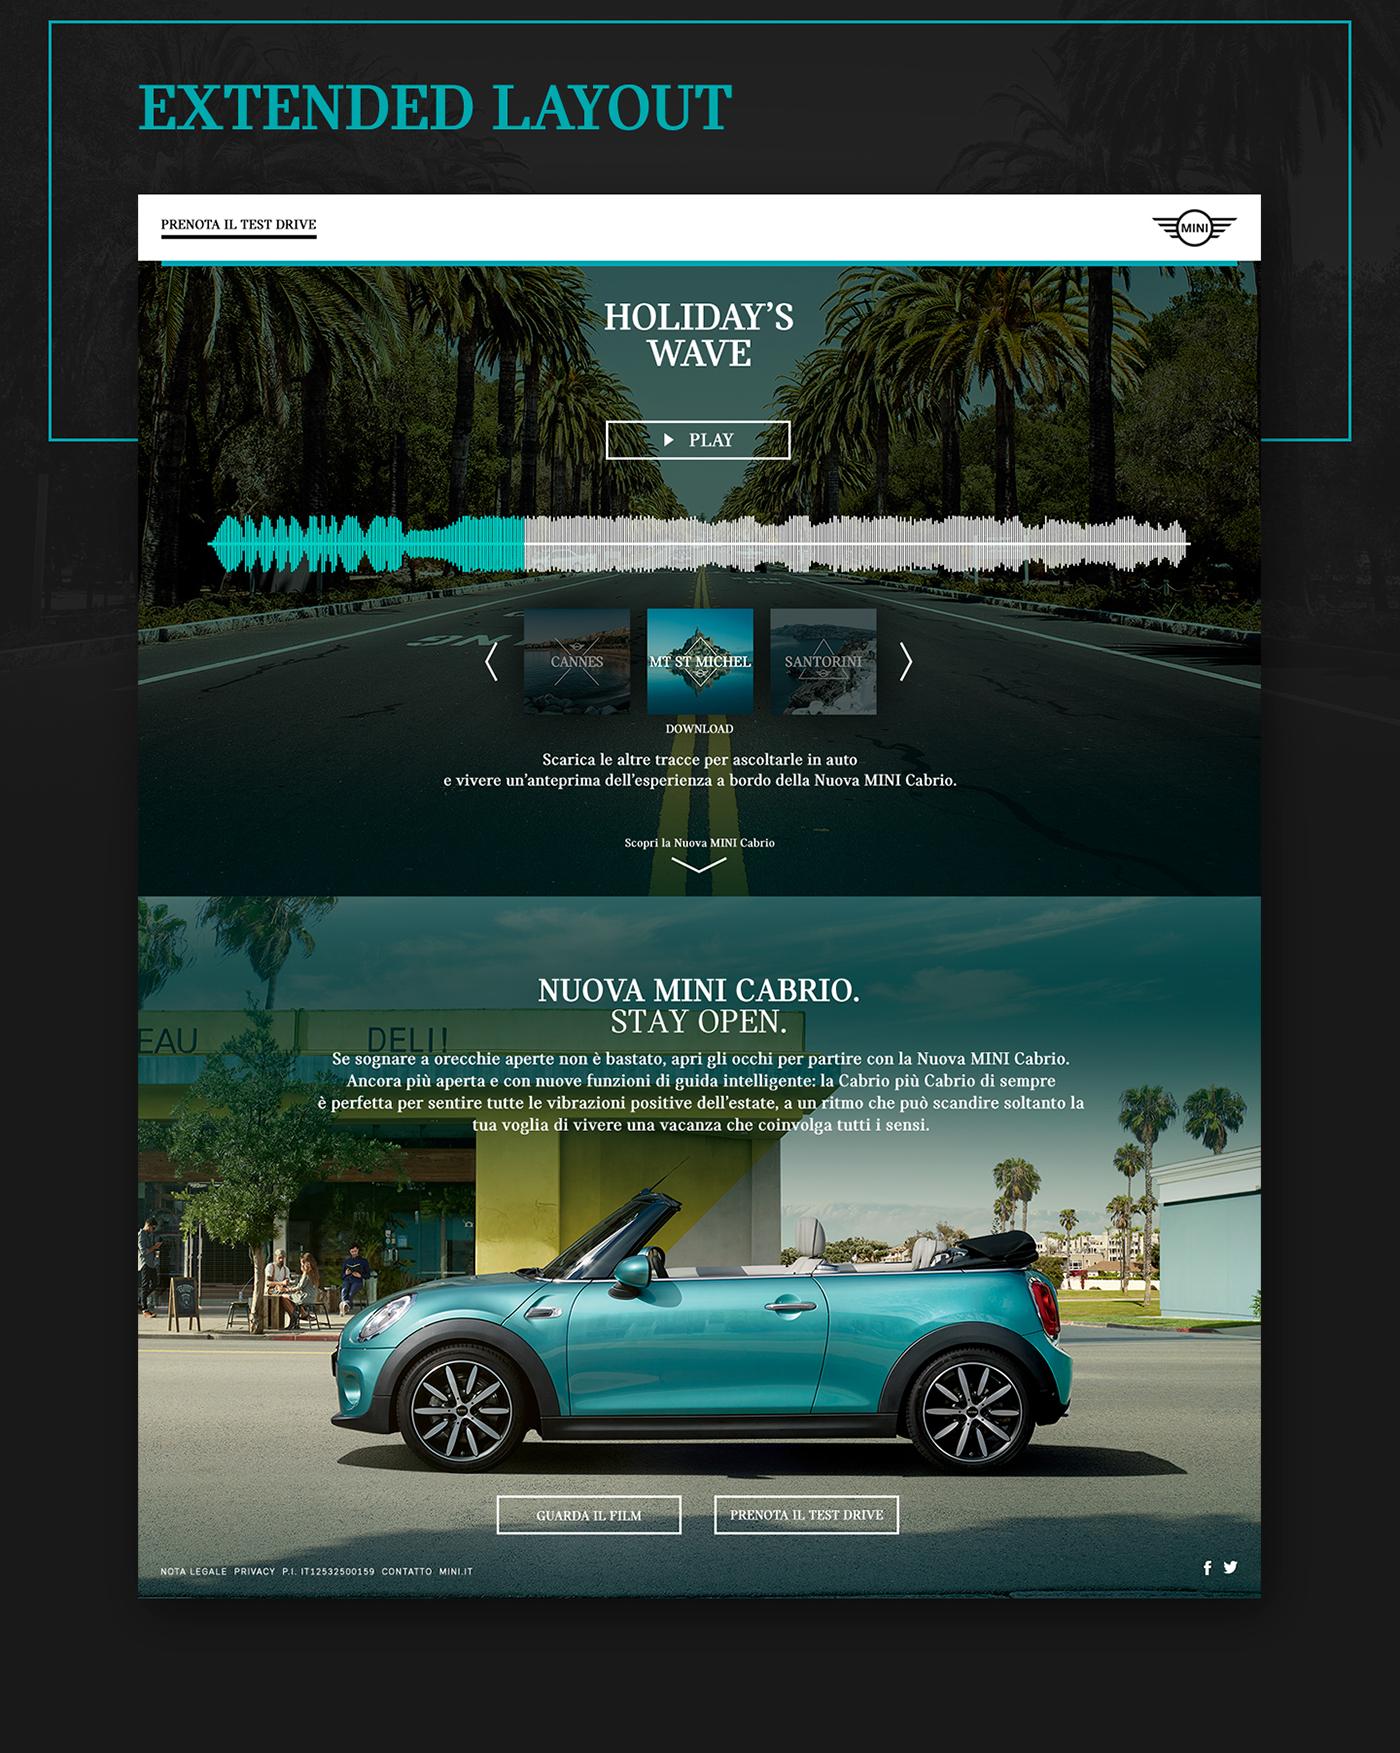 MINI mini cabrio Cabrio automotive   BMW MINI Cooper landing page Responsive Mockup summer dem convertible BMW group